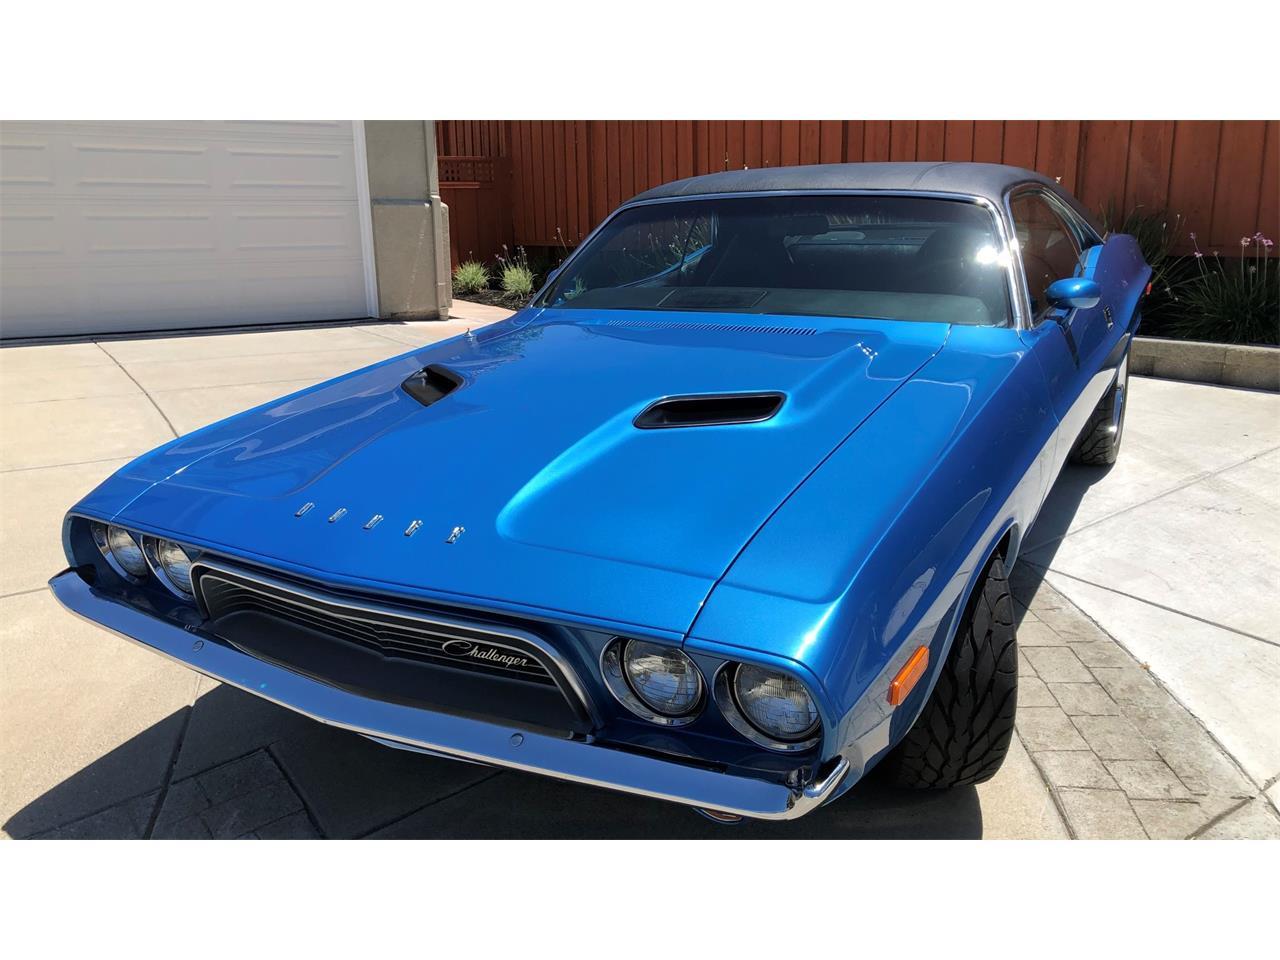 1974 Dodge Challenger (CC-1355522) for sale in Concord, California